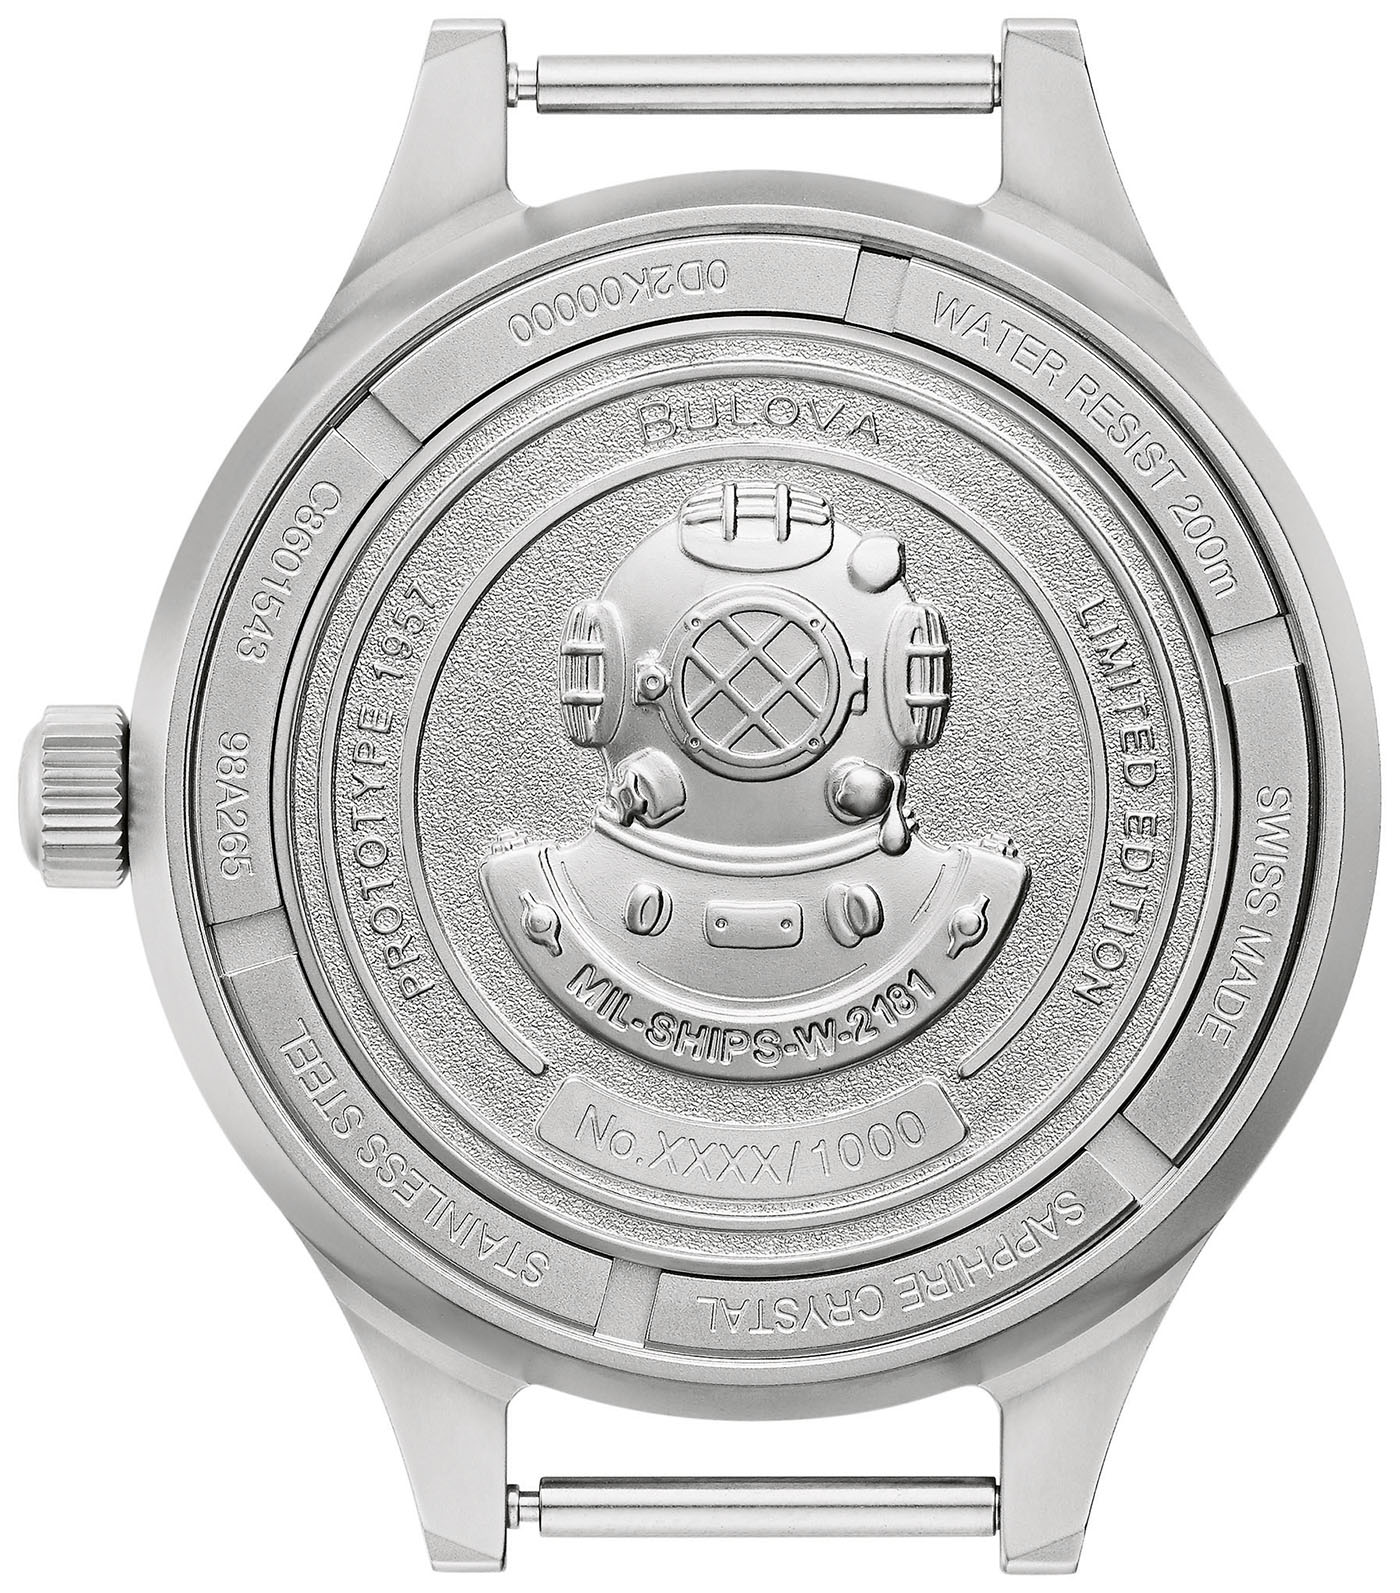 Bulova представляет дайверские часы Mil-Ships